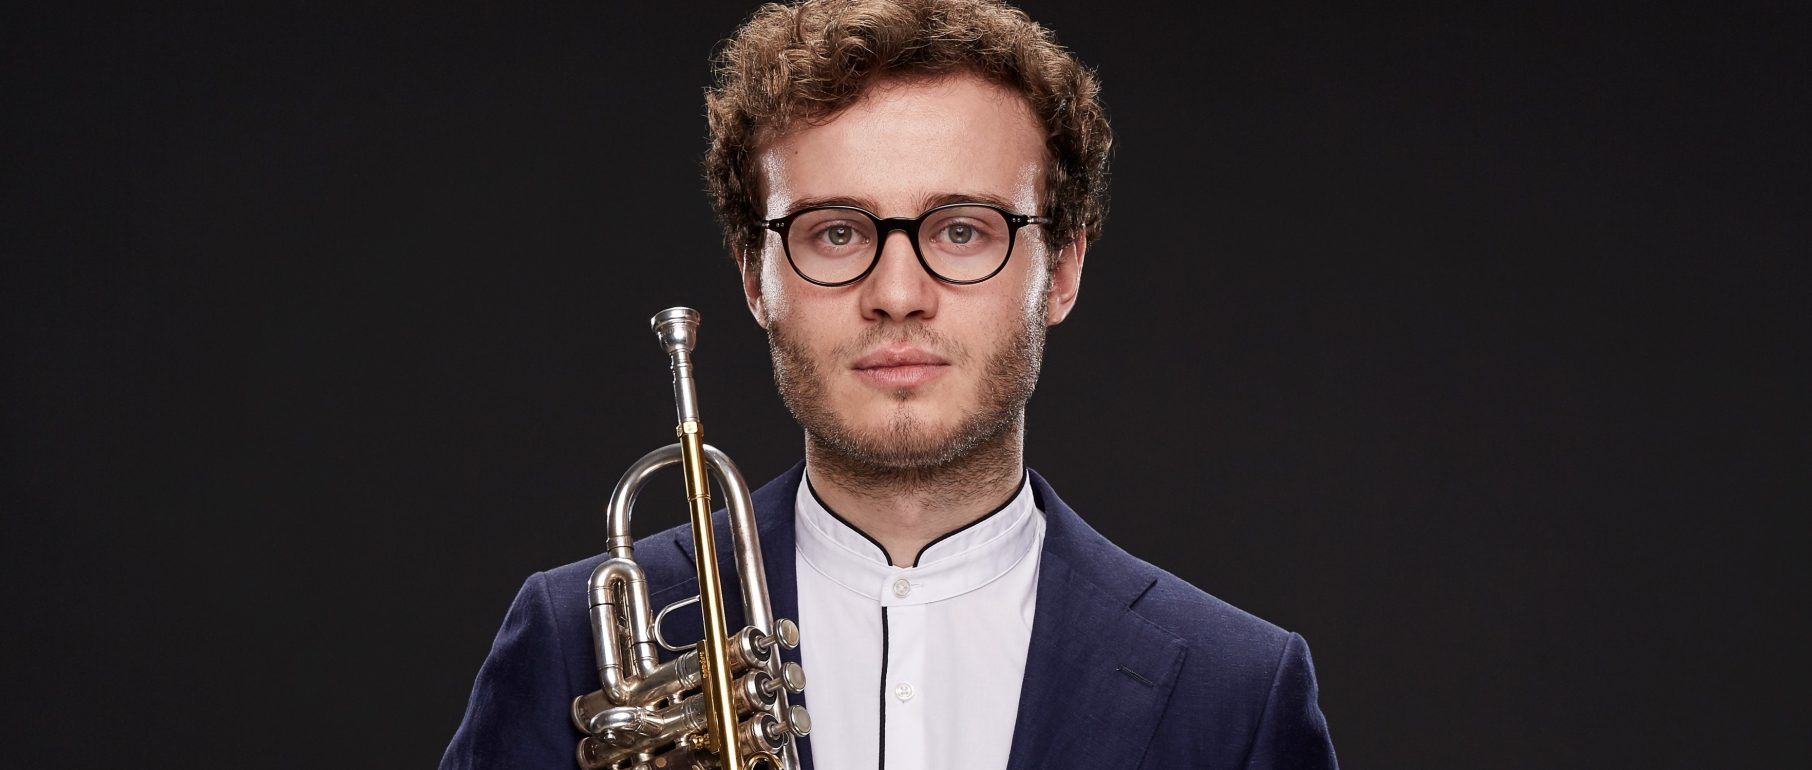 Portrait Simon Höfele, Trompete